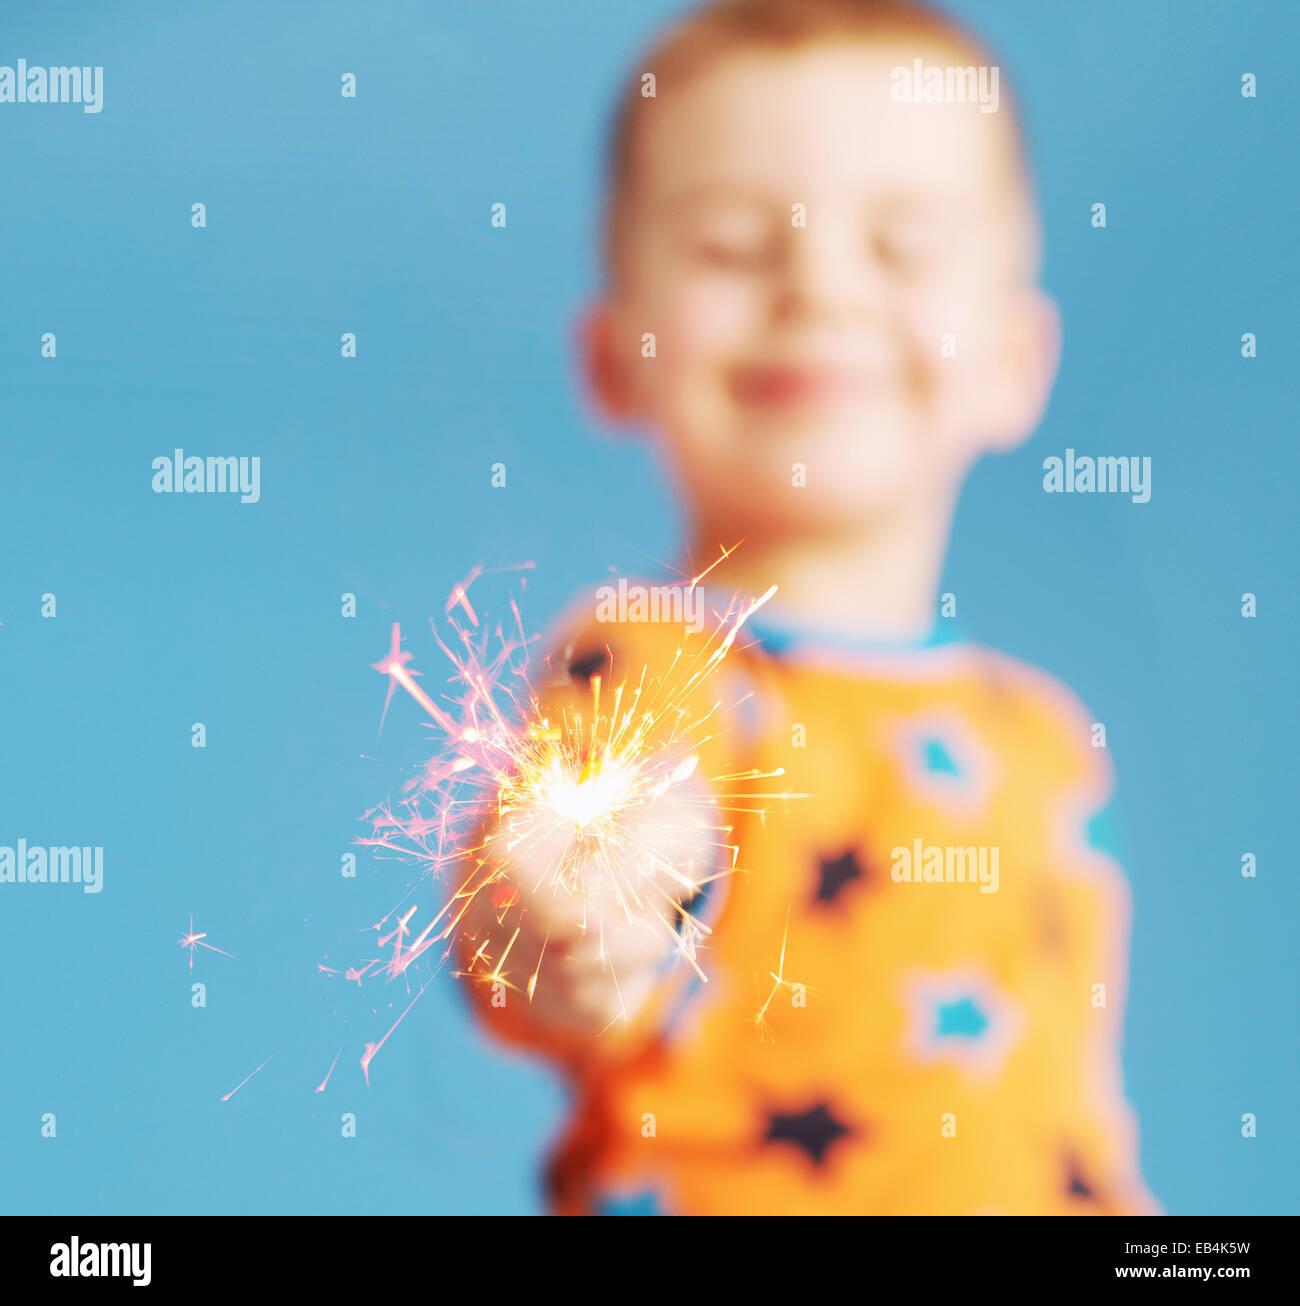 Blurred portrait of child holding a sparkler - Stock Image